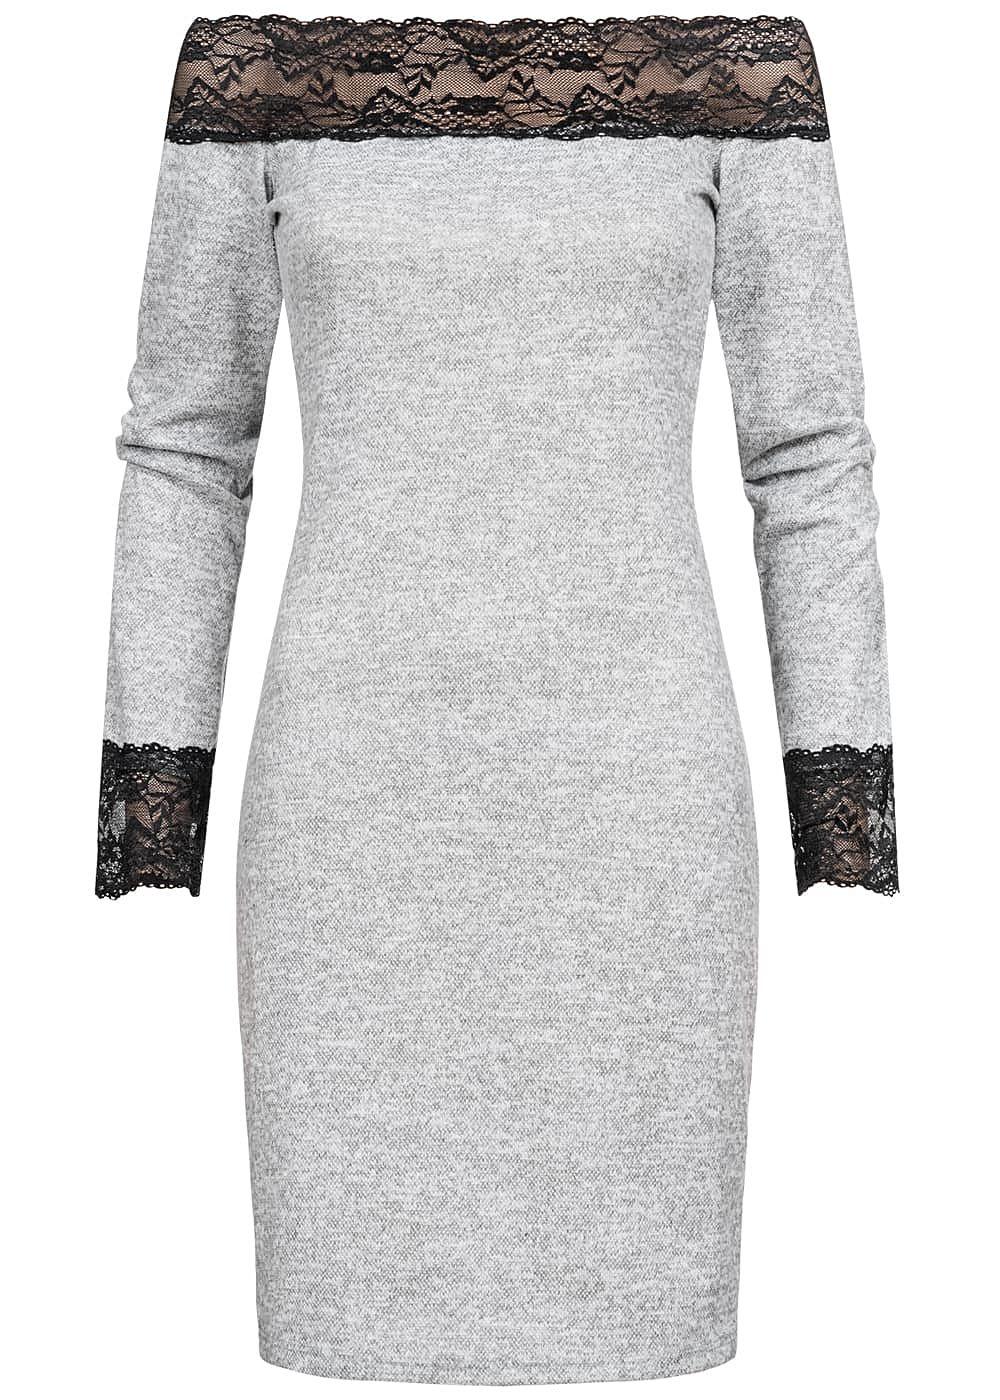 Styleboom Fashion Damen Off-Shoulder Melange Kleid Spitze ...